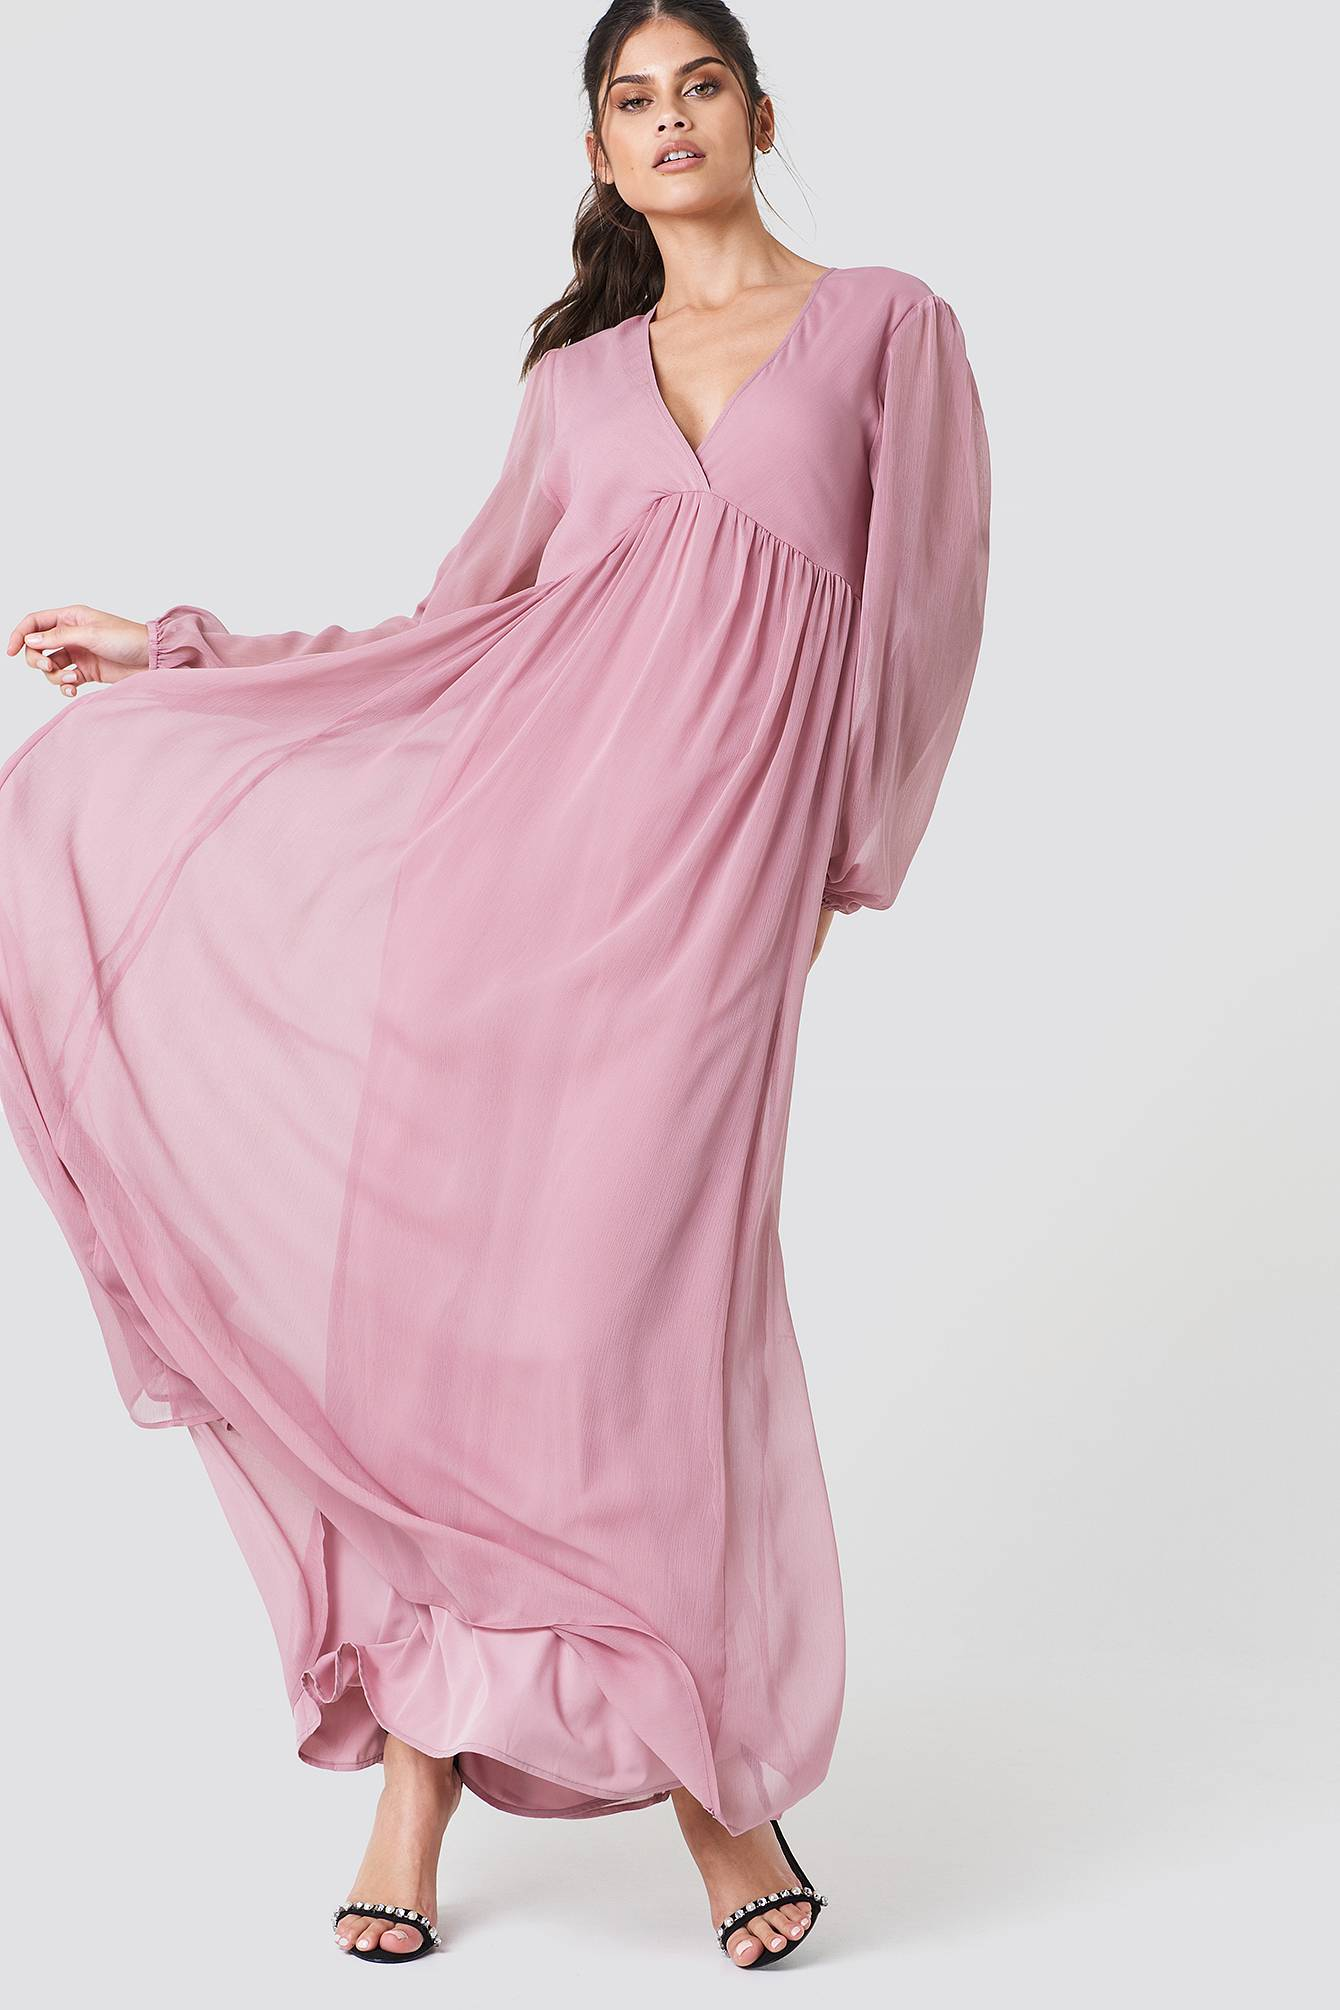 Image of NA-KD Boho Wide Balloon Sleeve Chiffon Dress - Pink